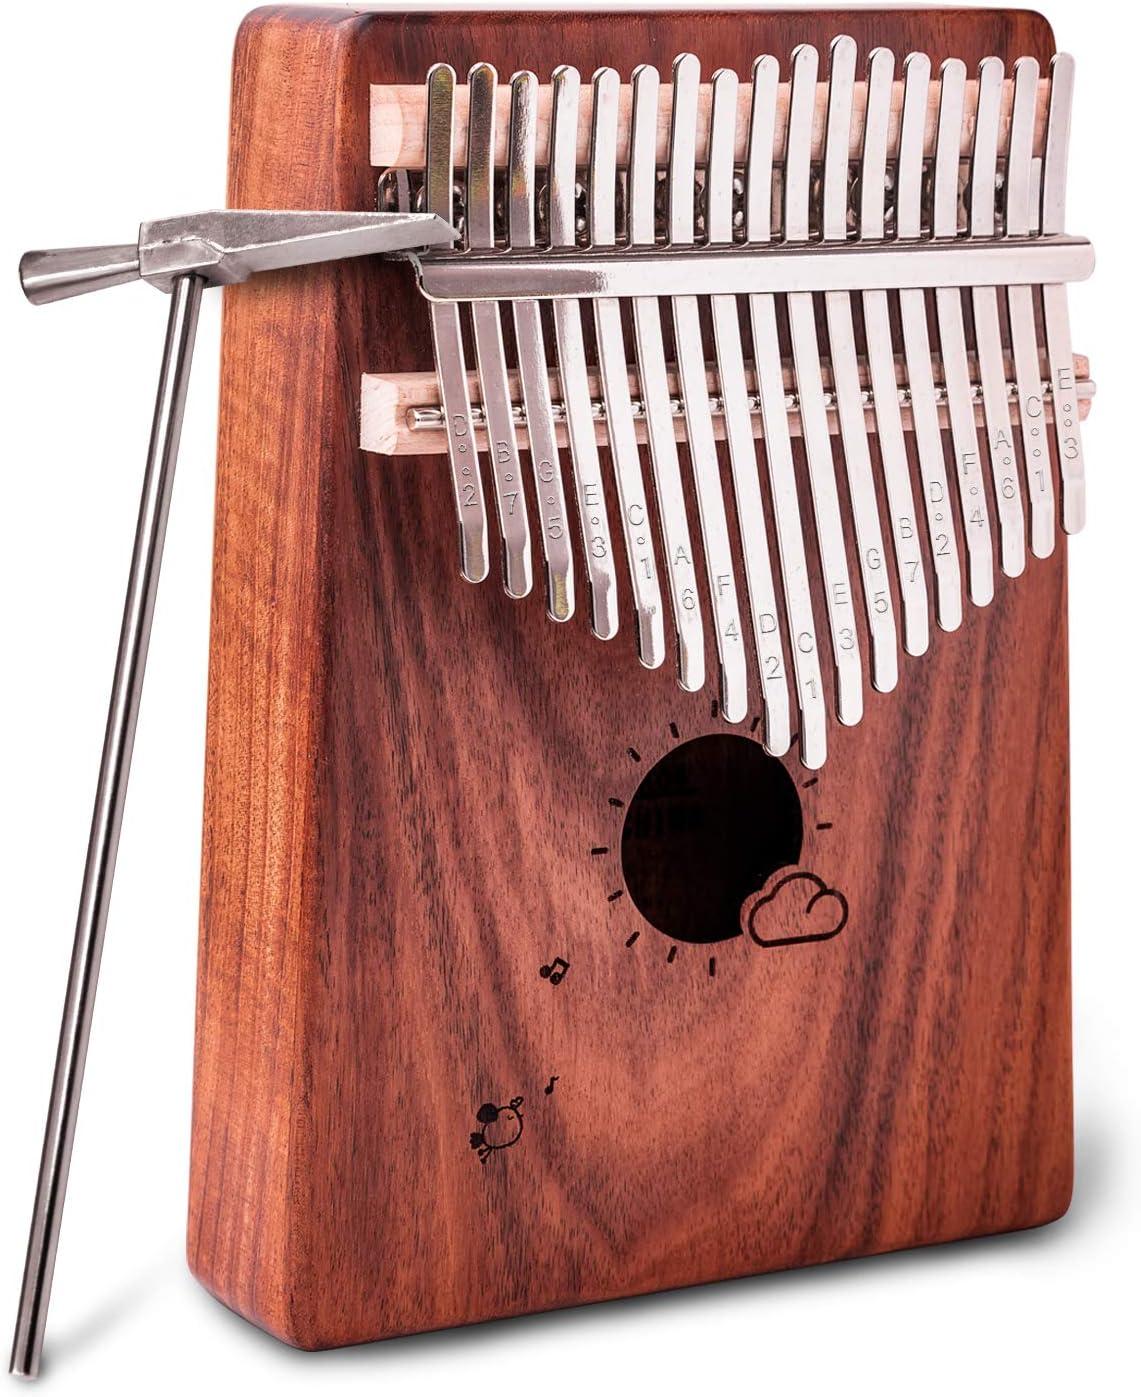 Finger Piano NASUM 17 Key Kalimba Thumb Piano Pocket Thumb Piano Mahogany Body for Beginners and Advanced Player Finger Percussion Keyboard with Instruction and Tune Hammer